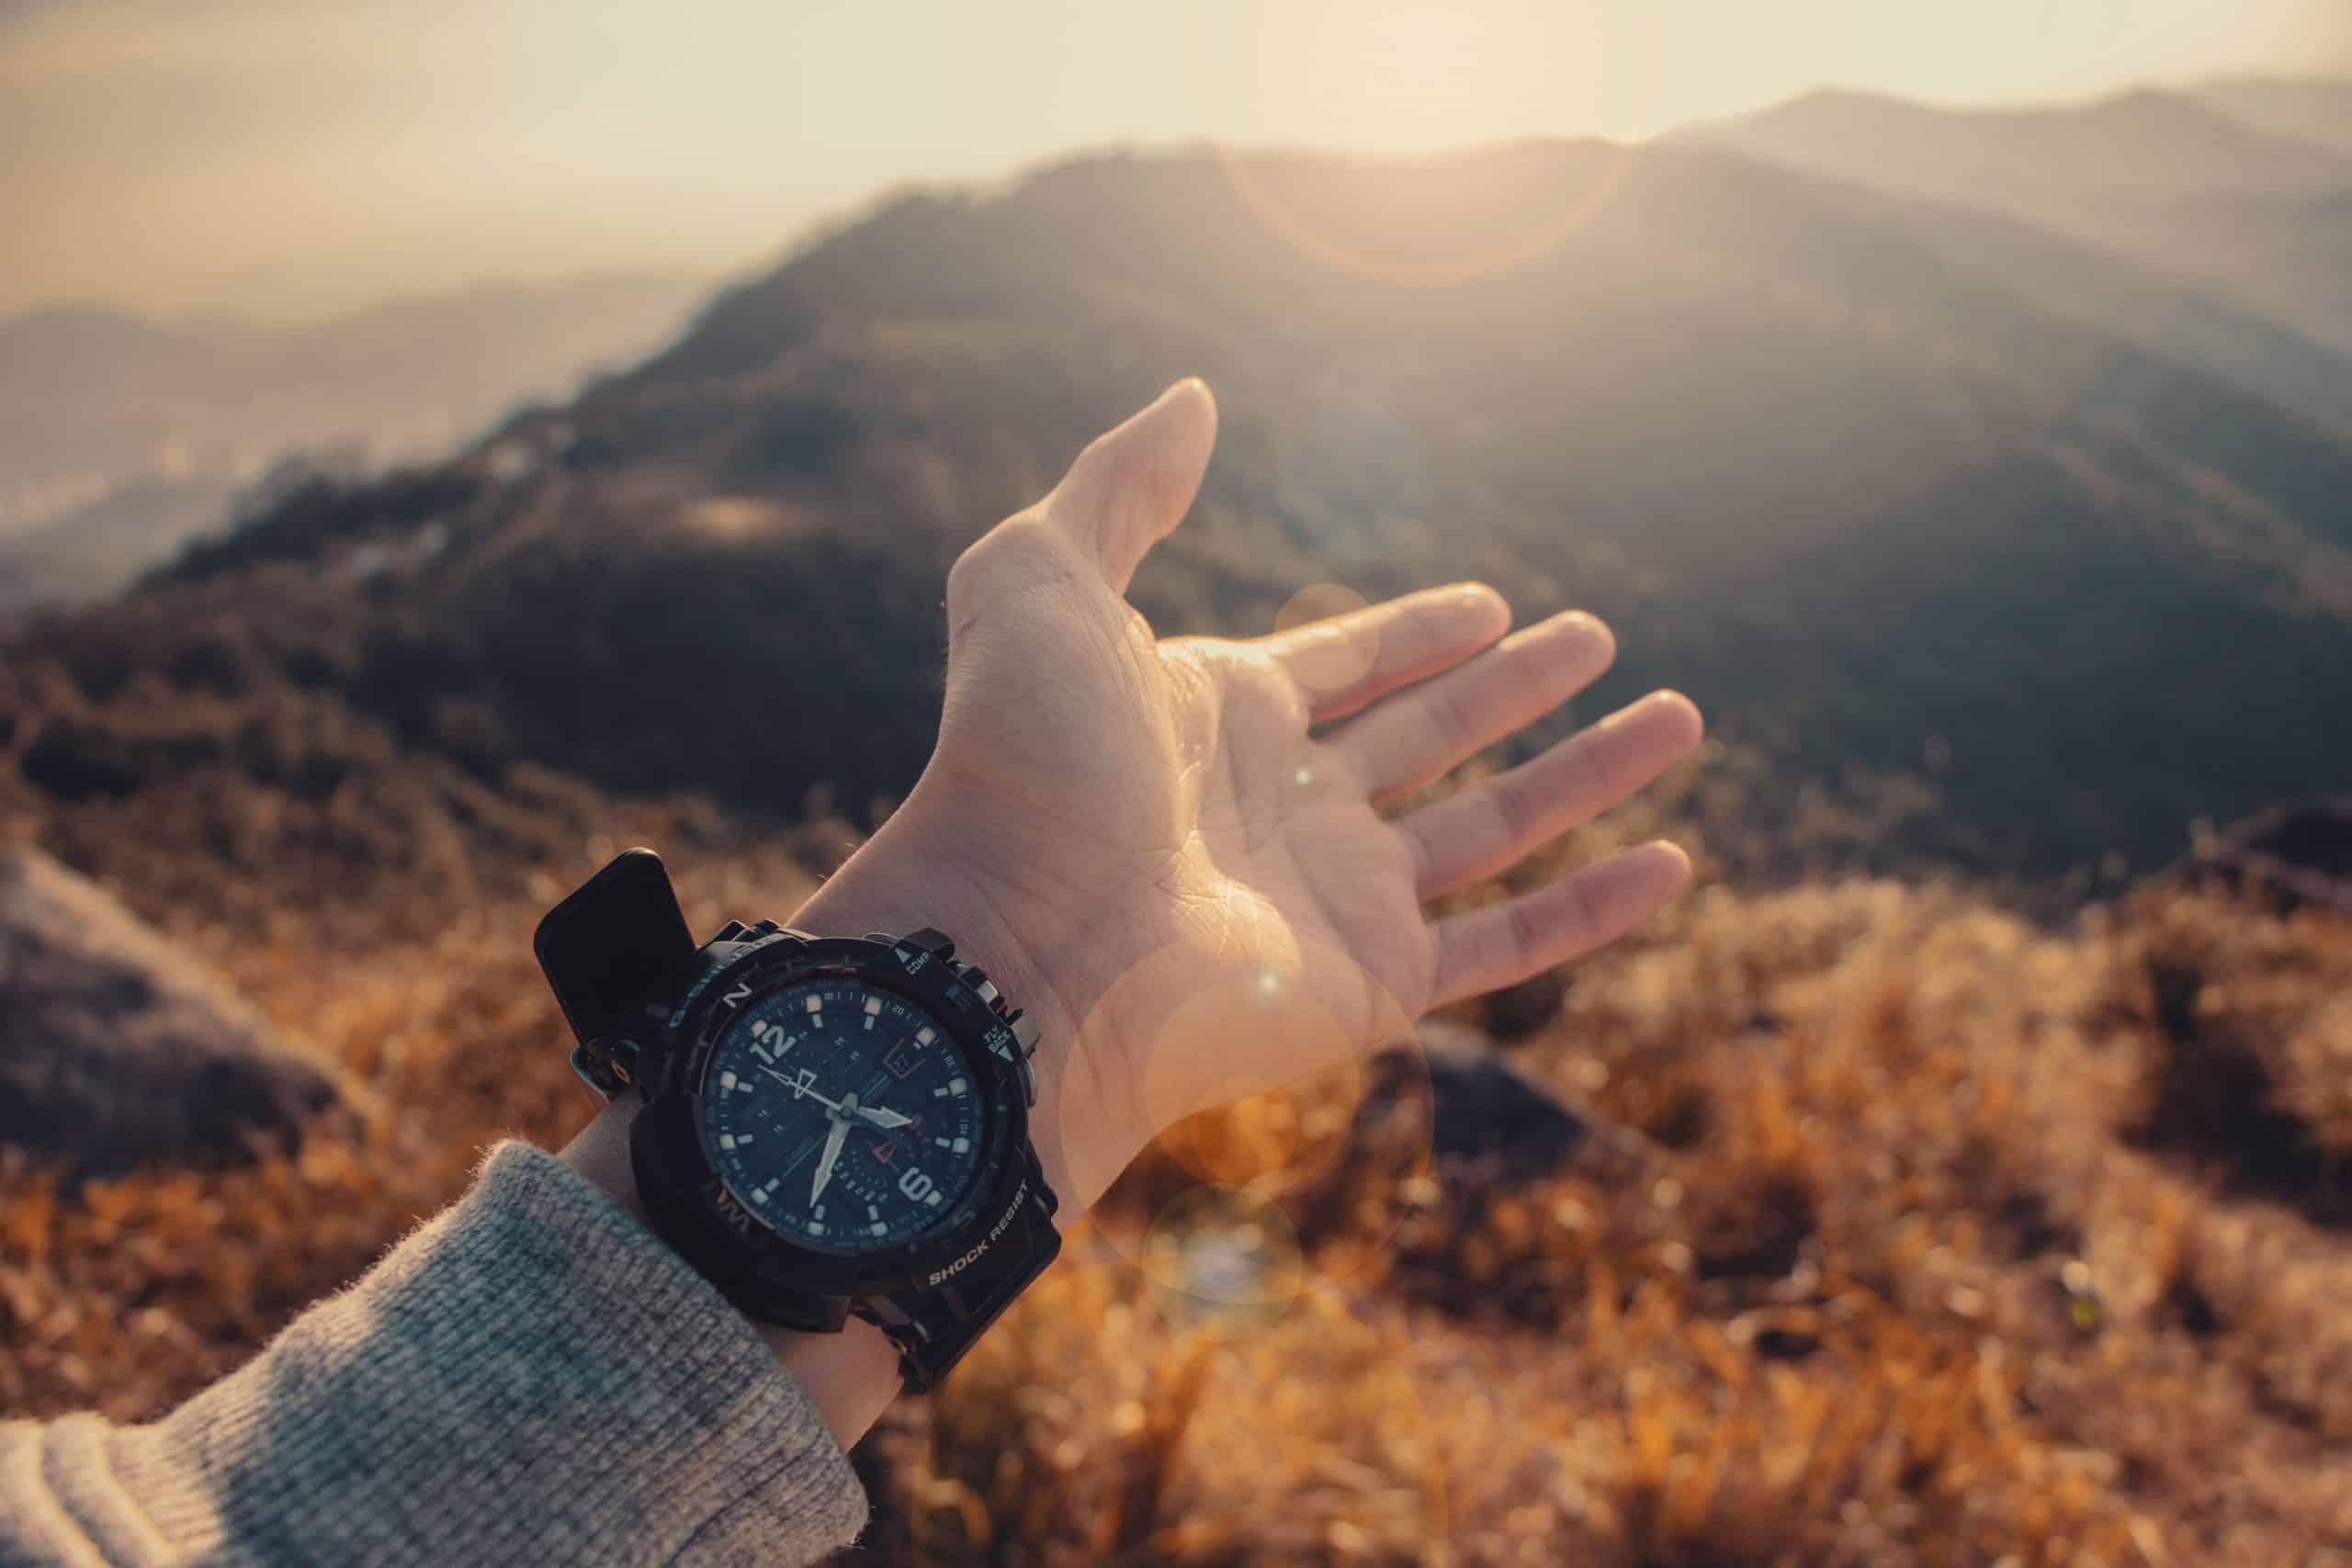 hiking watch